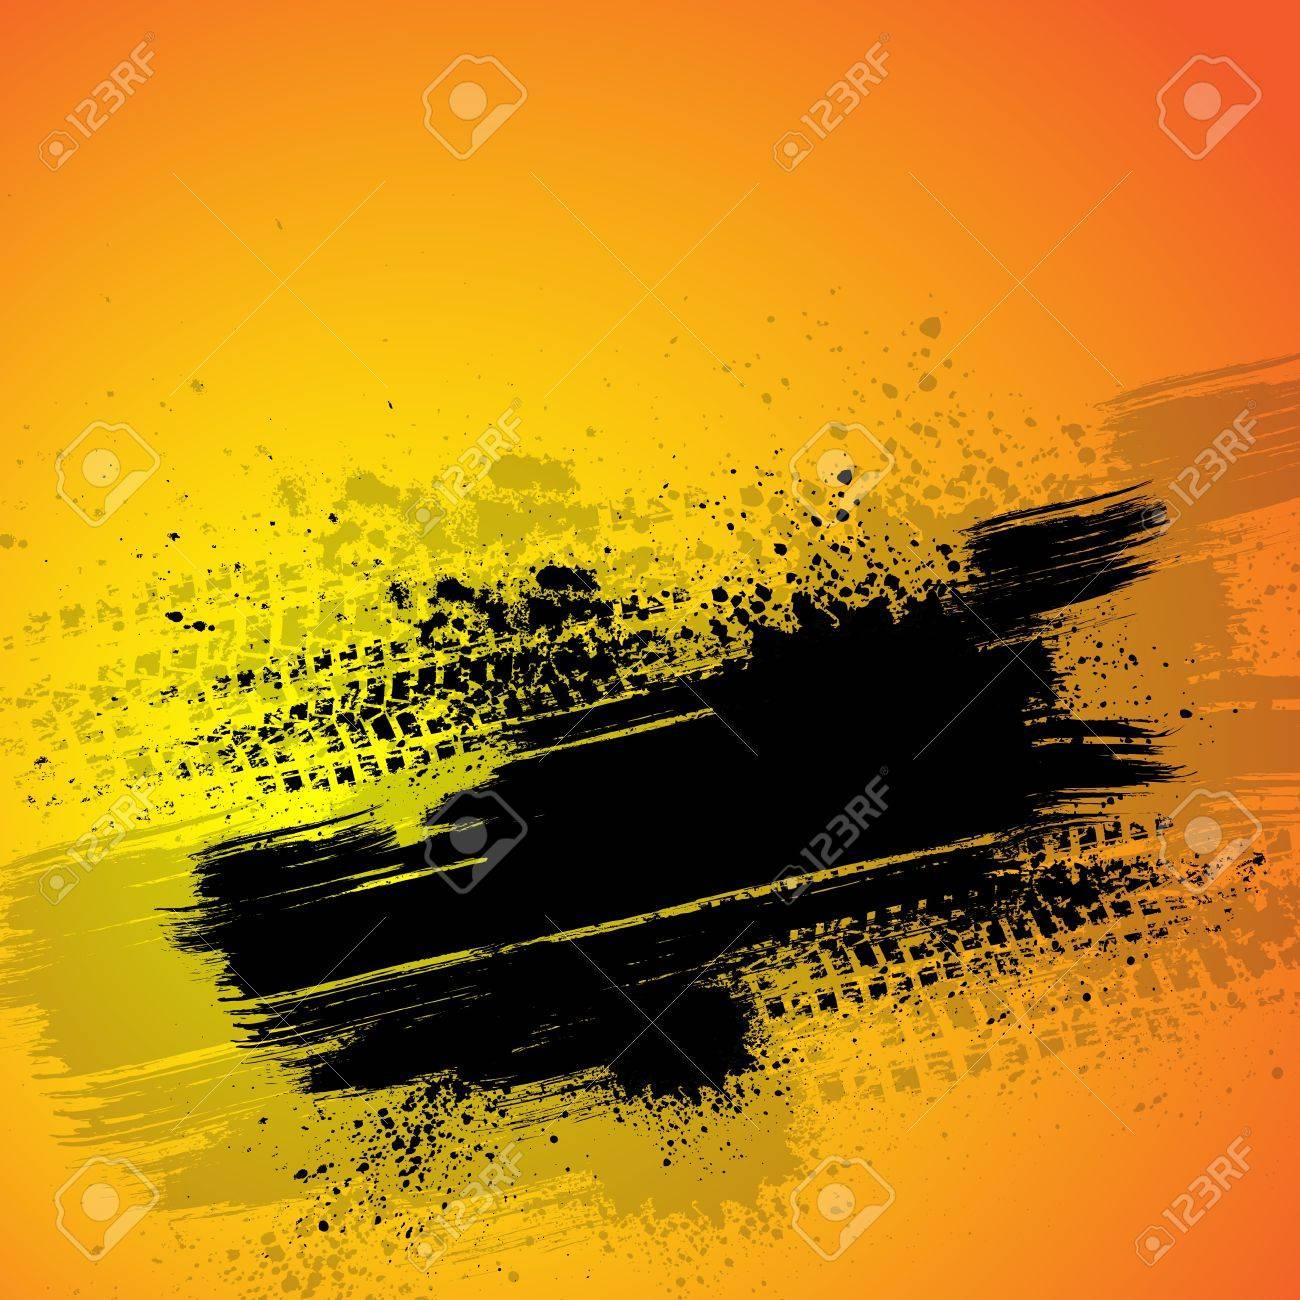 Orange tire track background - 19079807